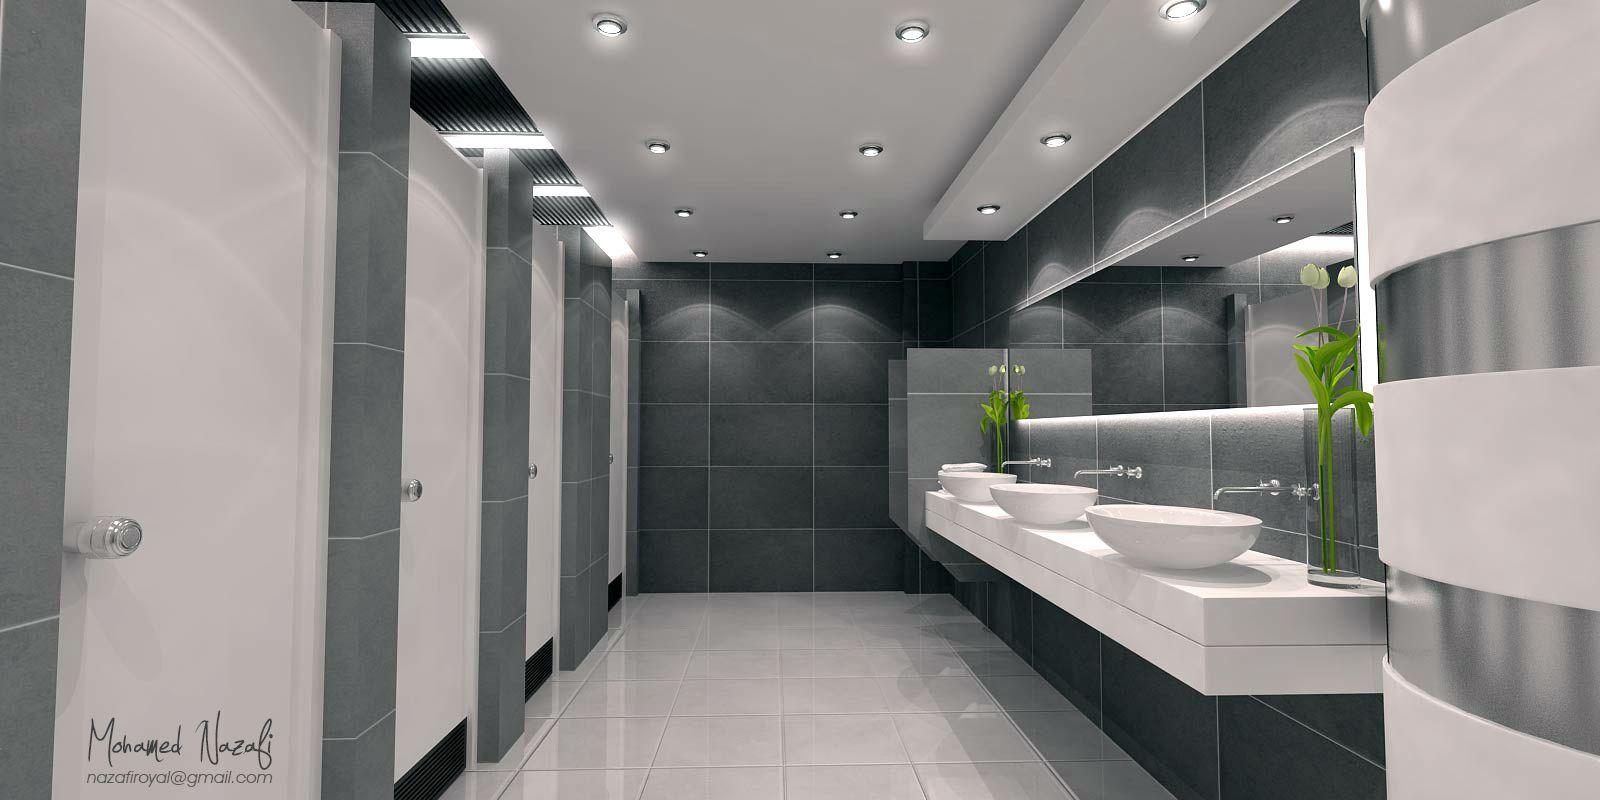 office washroom design. industrial office washroom design